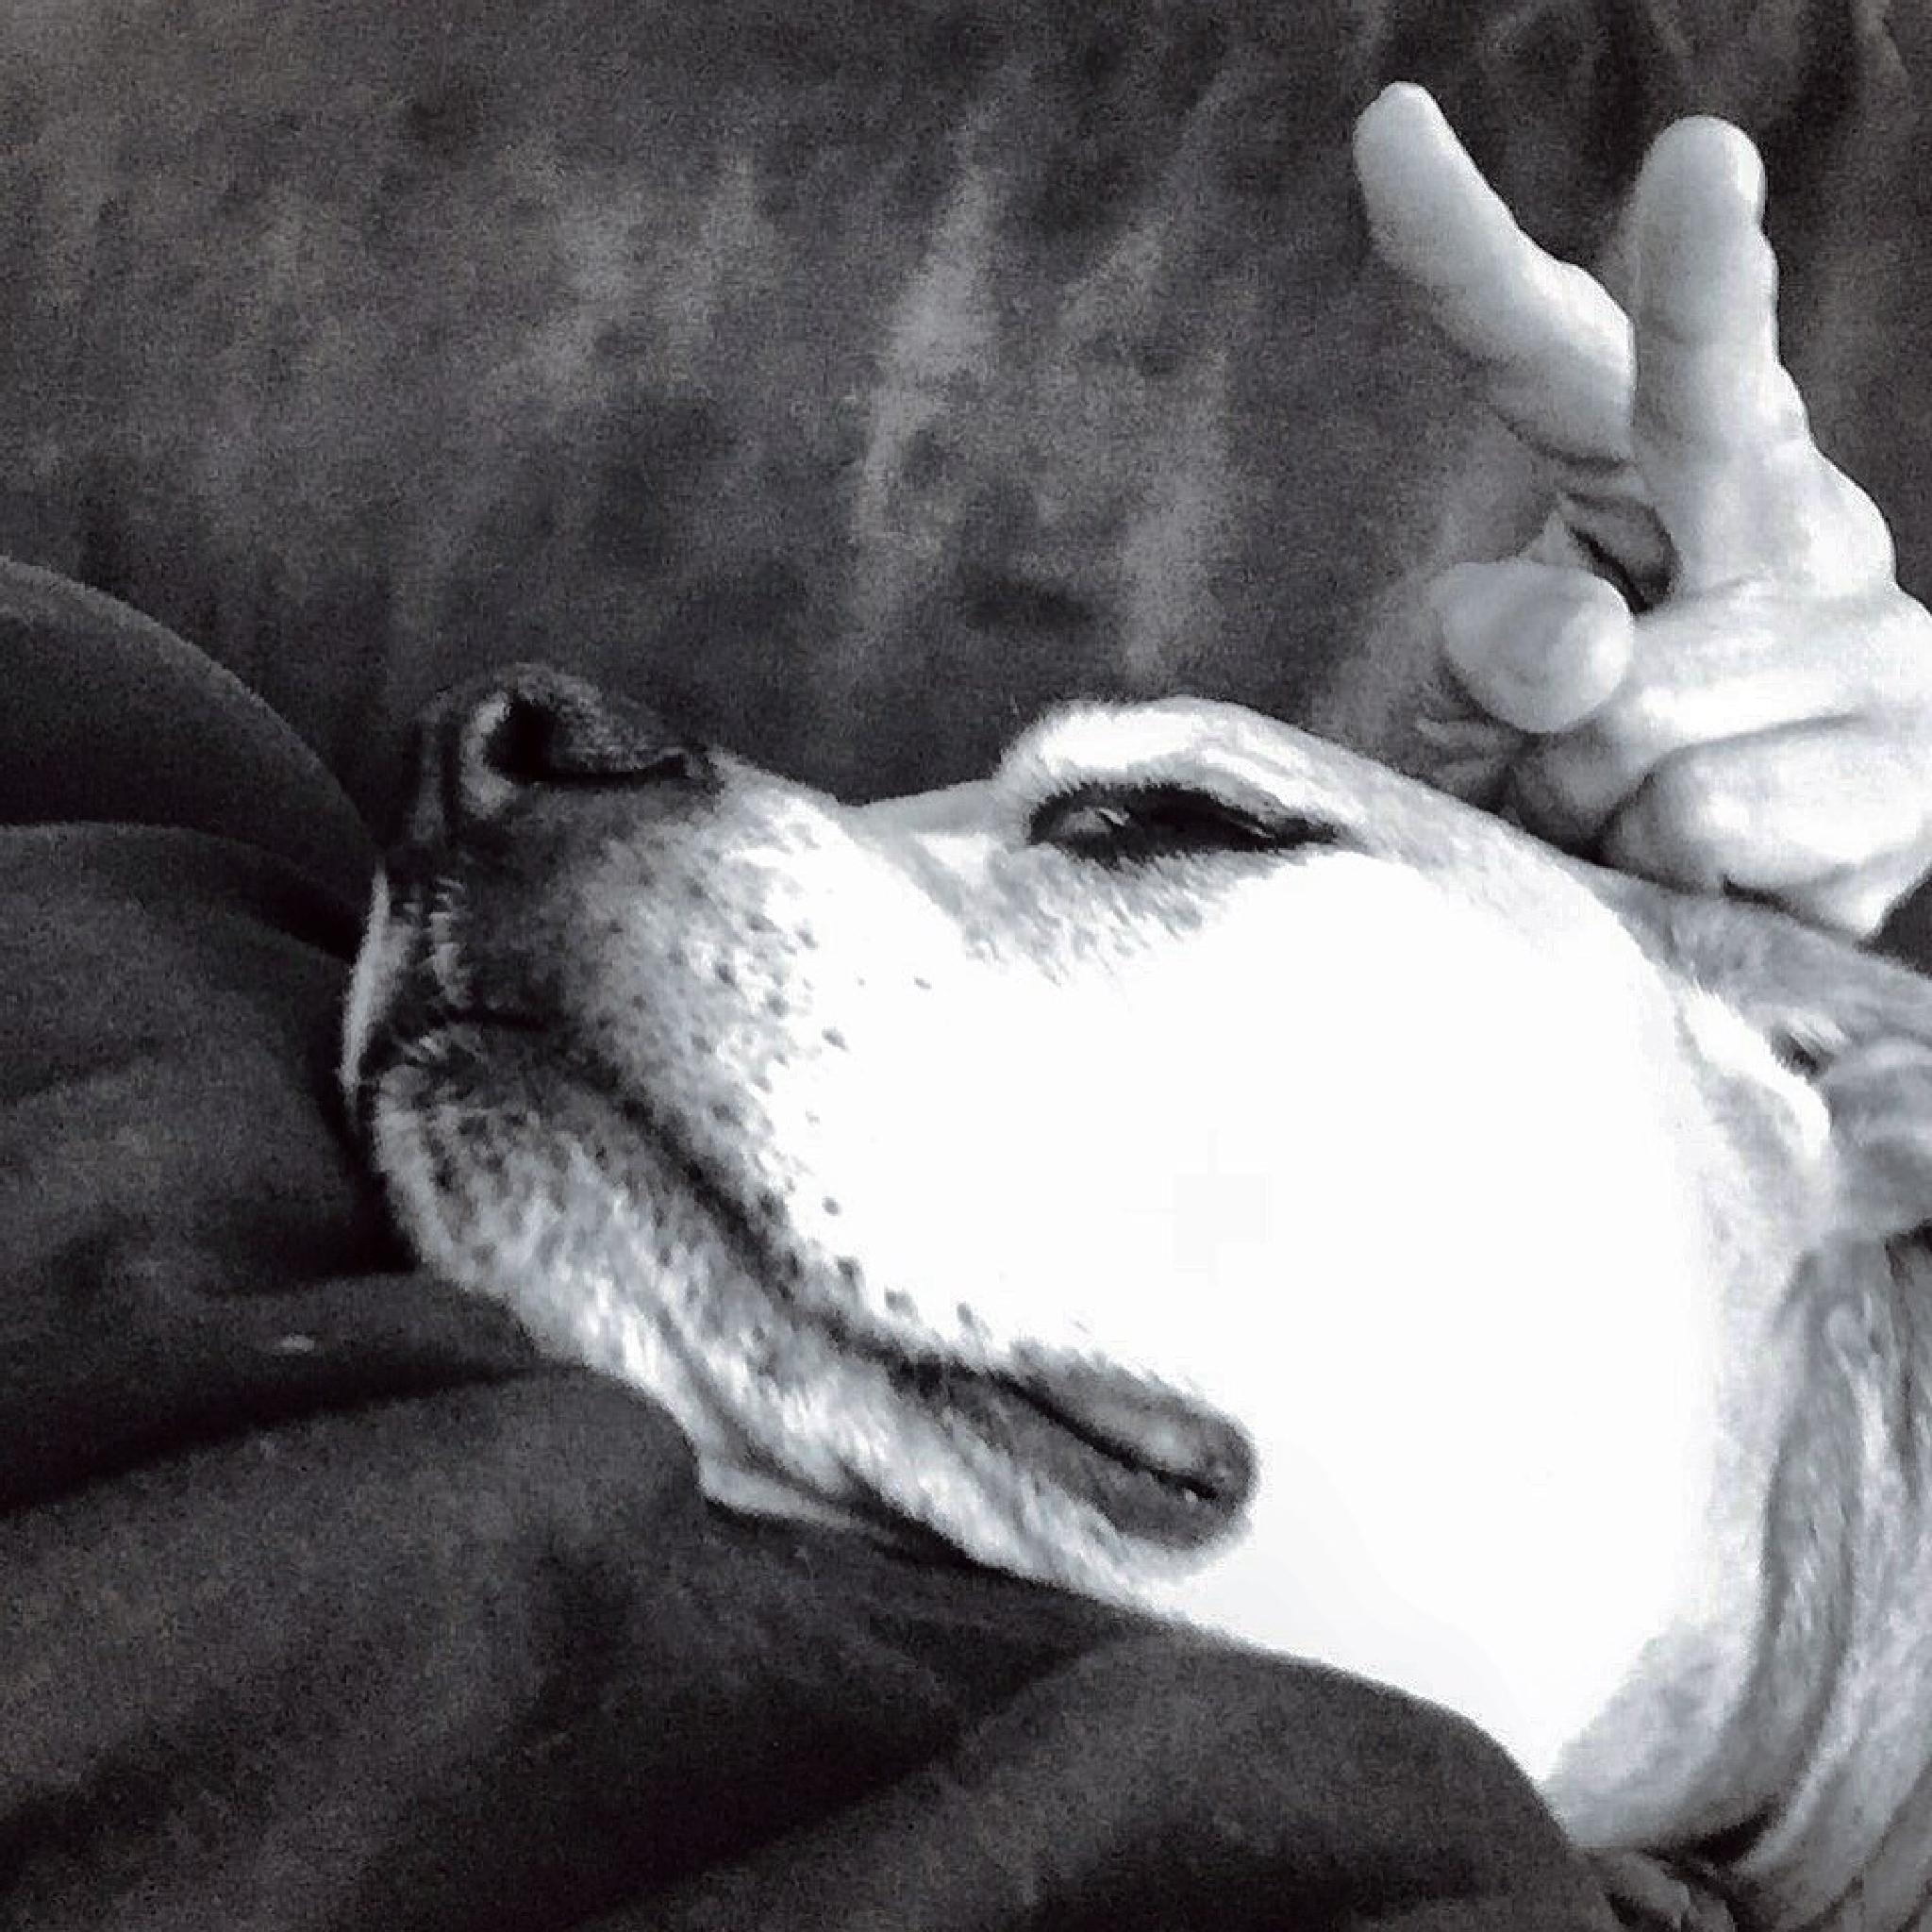 The best pooch ever by maryann.mishko